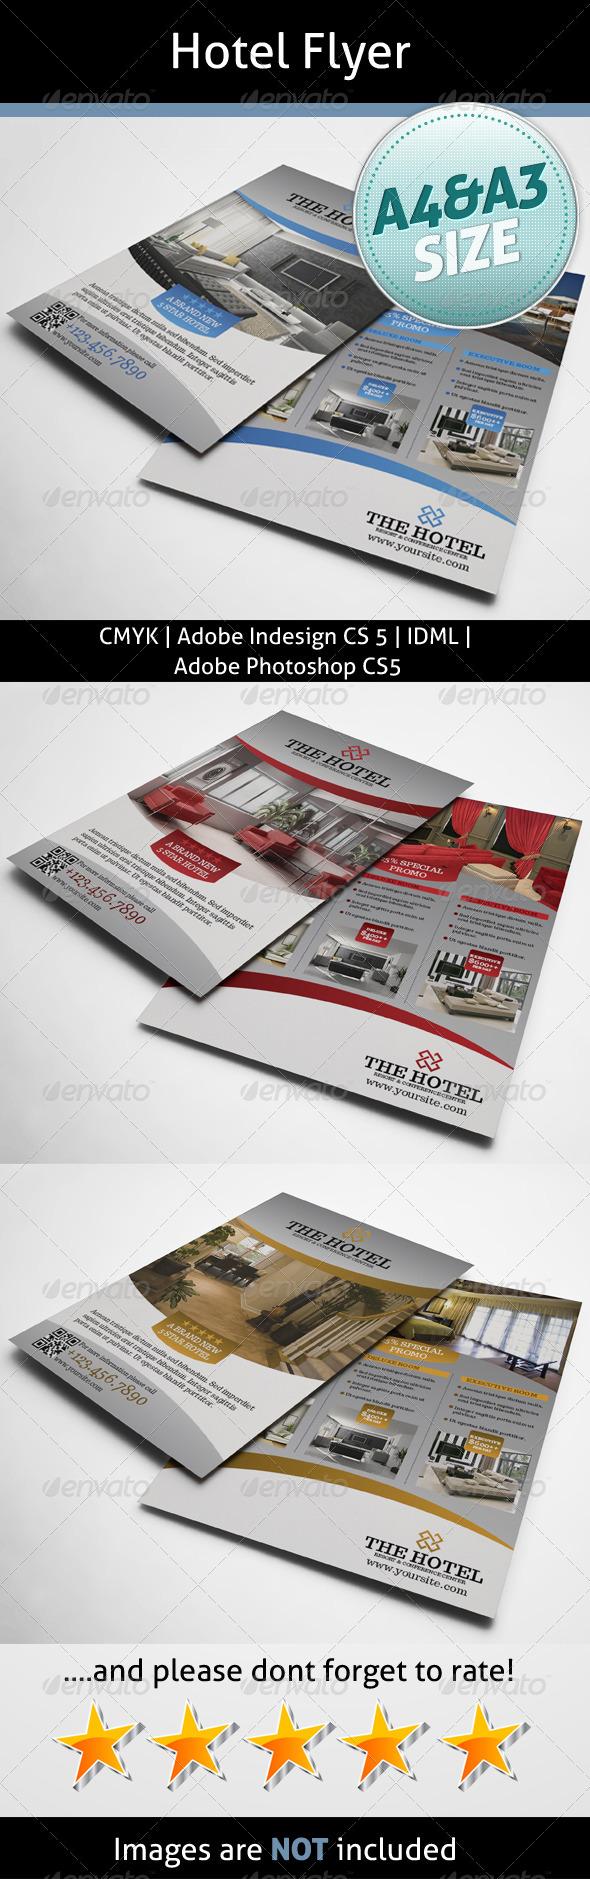 Hotel Flyer - Print Templates